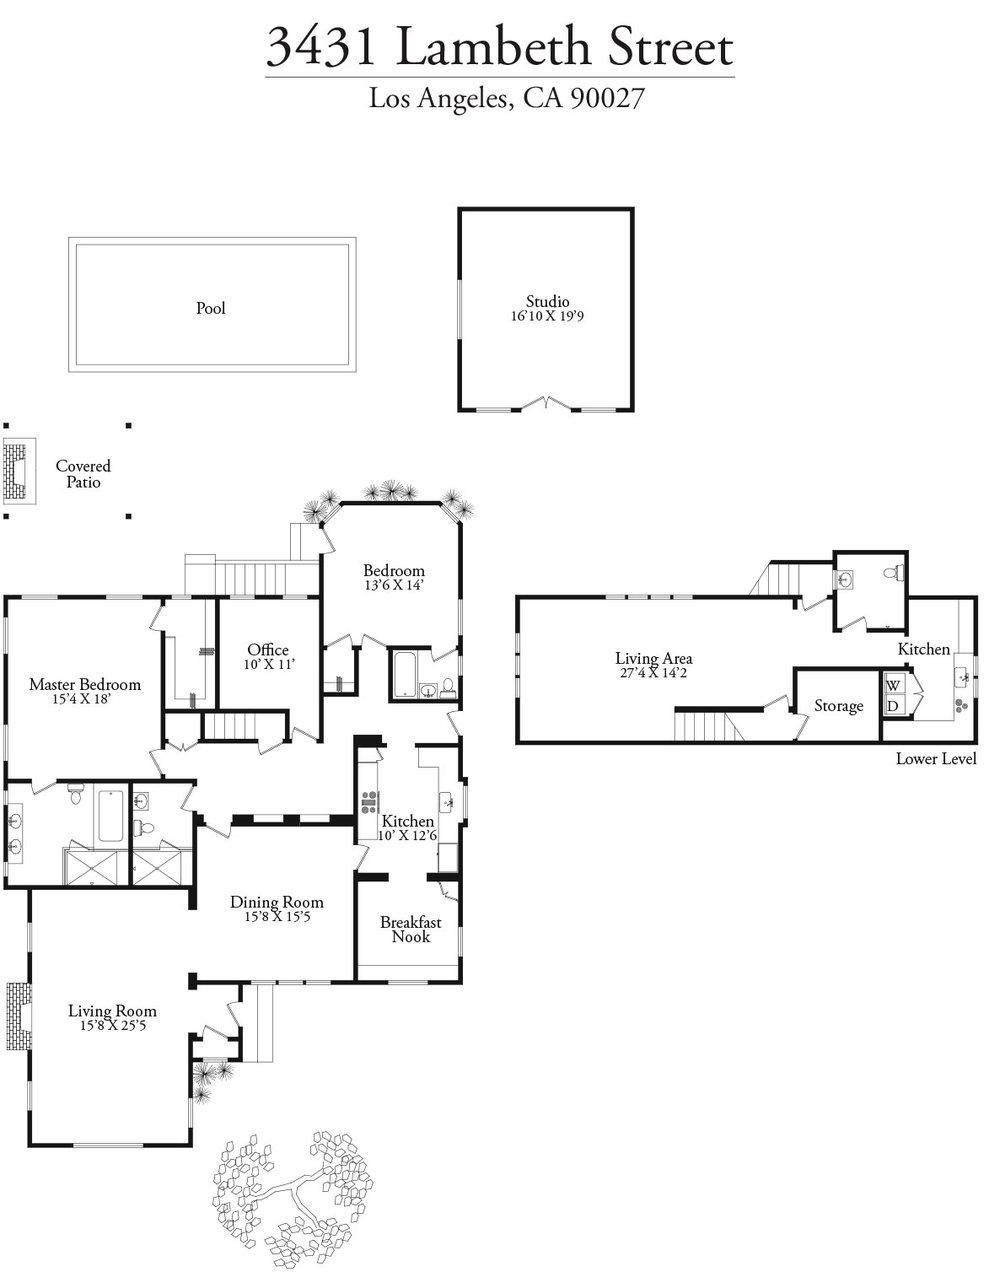 _Lambeth_Floor_Plan.jpg